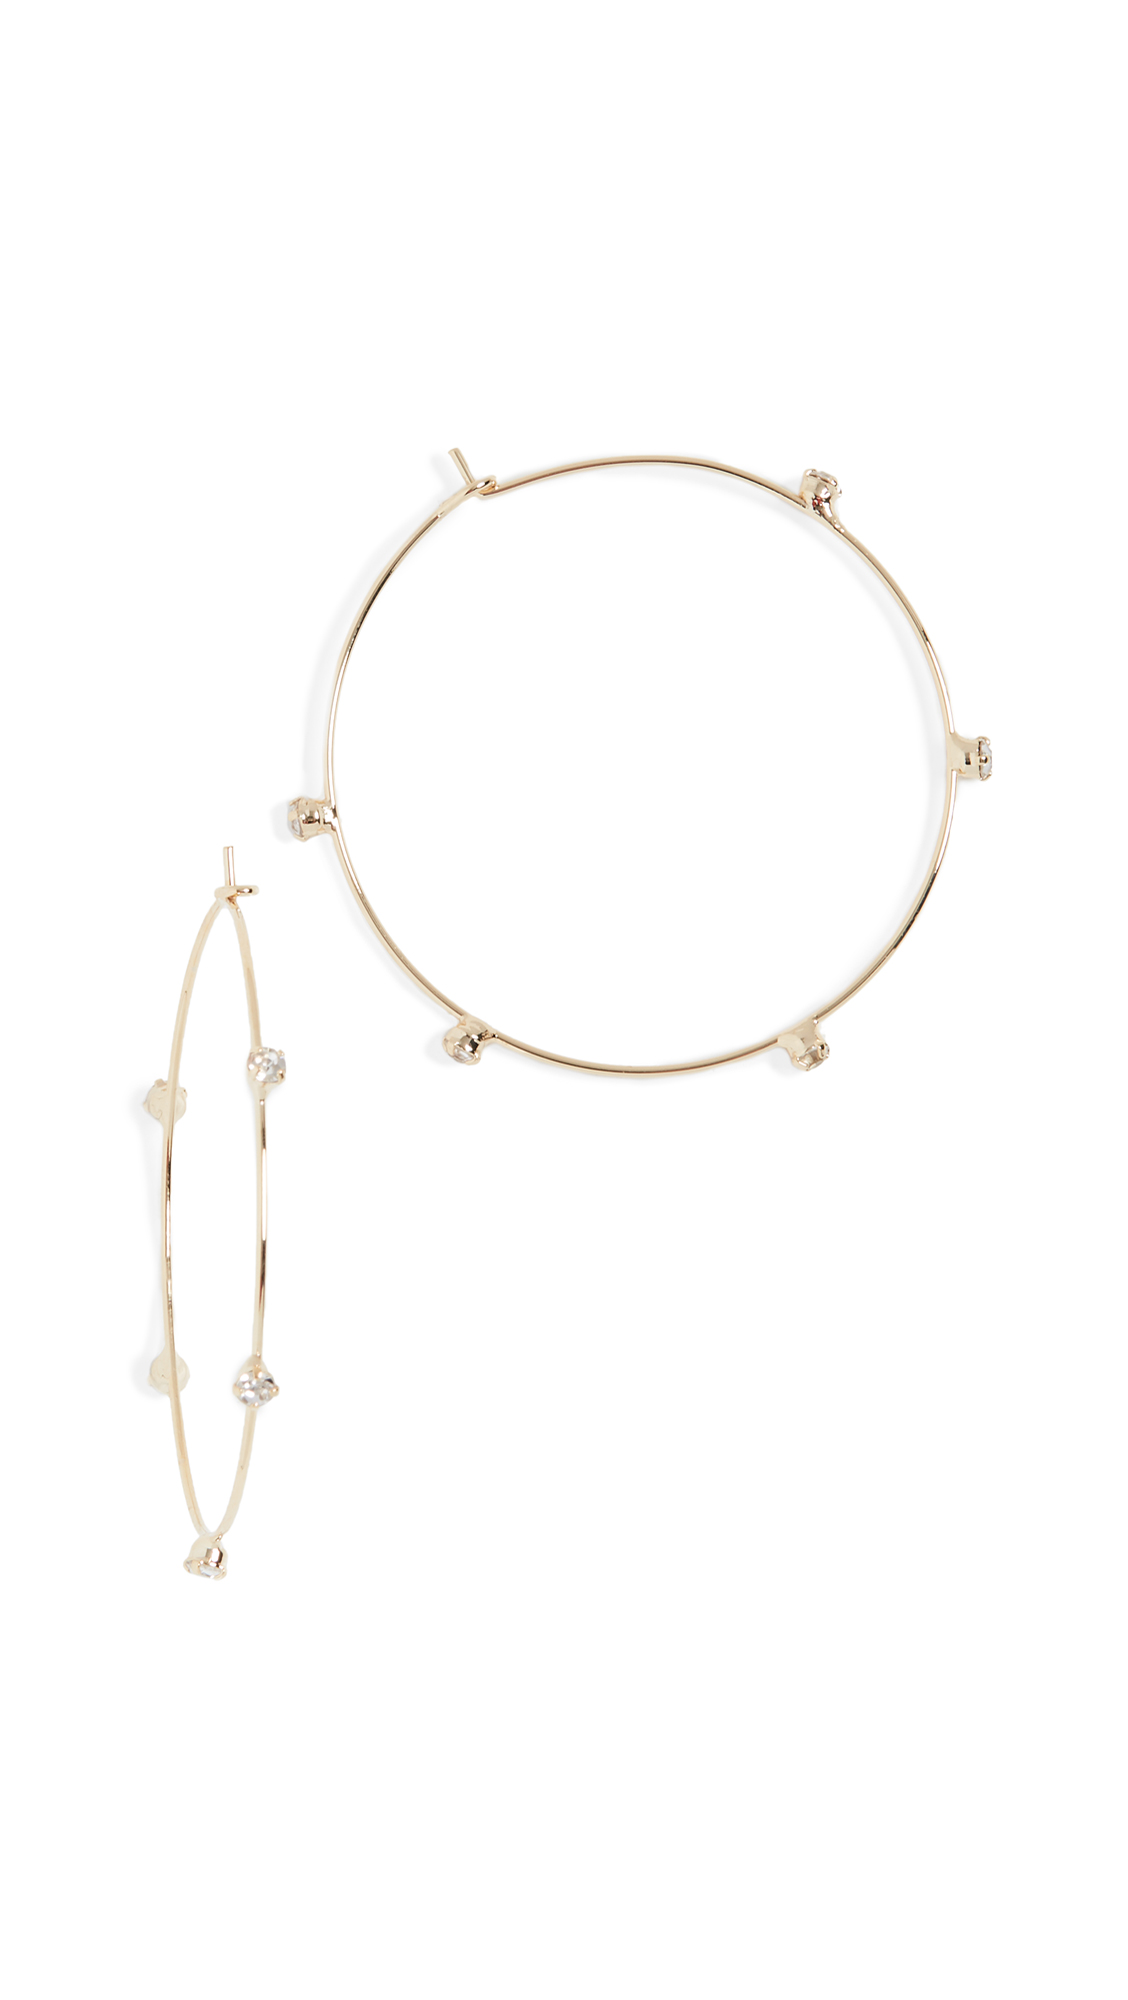 Jules Smith Crystal Hoop Earrings In Yellow Gold